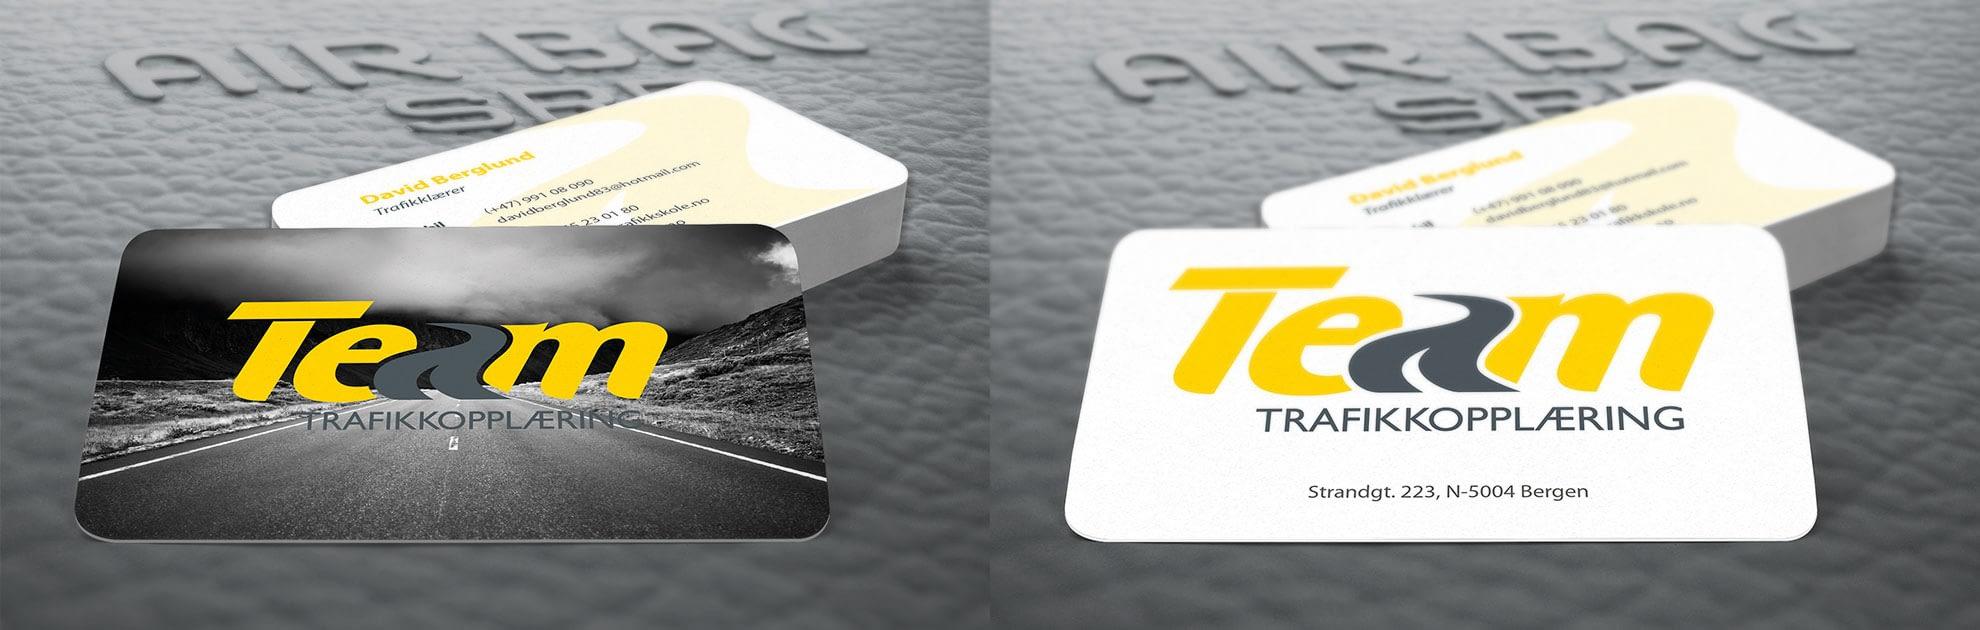 Visittkort design trafikkskole med runde hjørner og svært høy kvalitet på både trykk og papir.